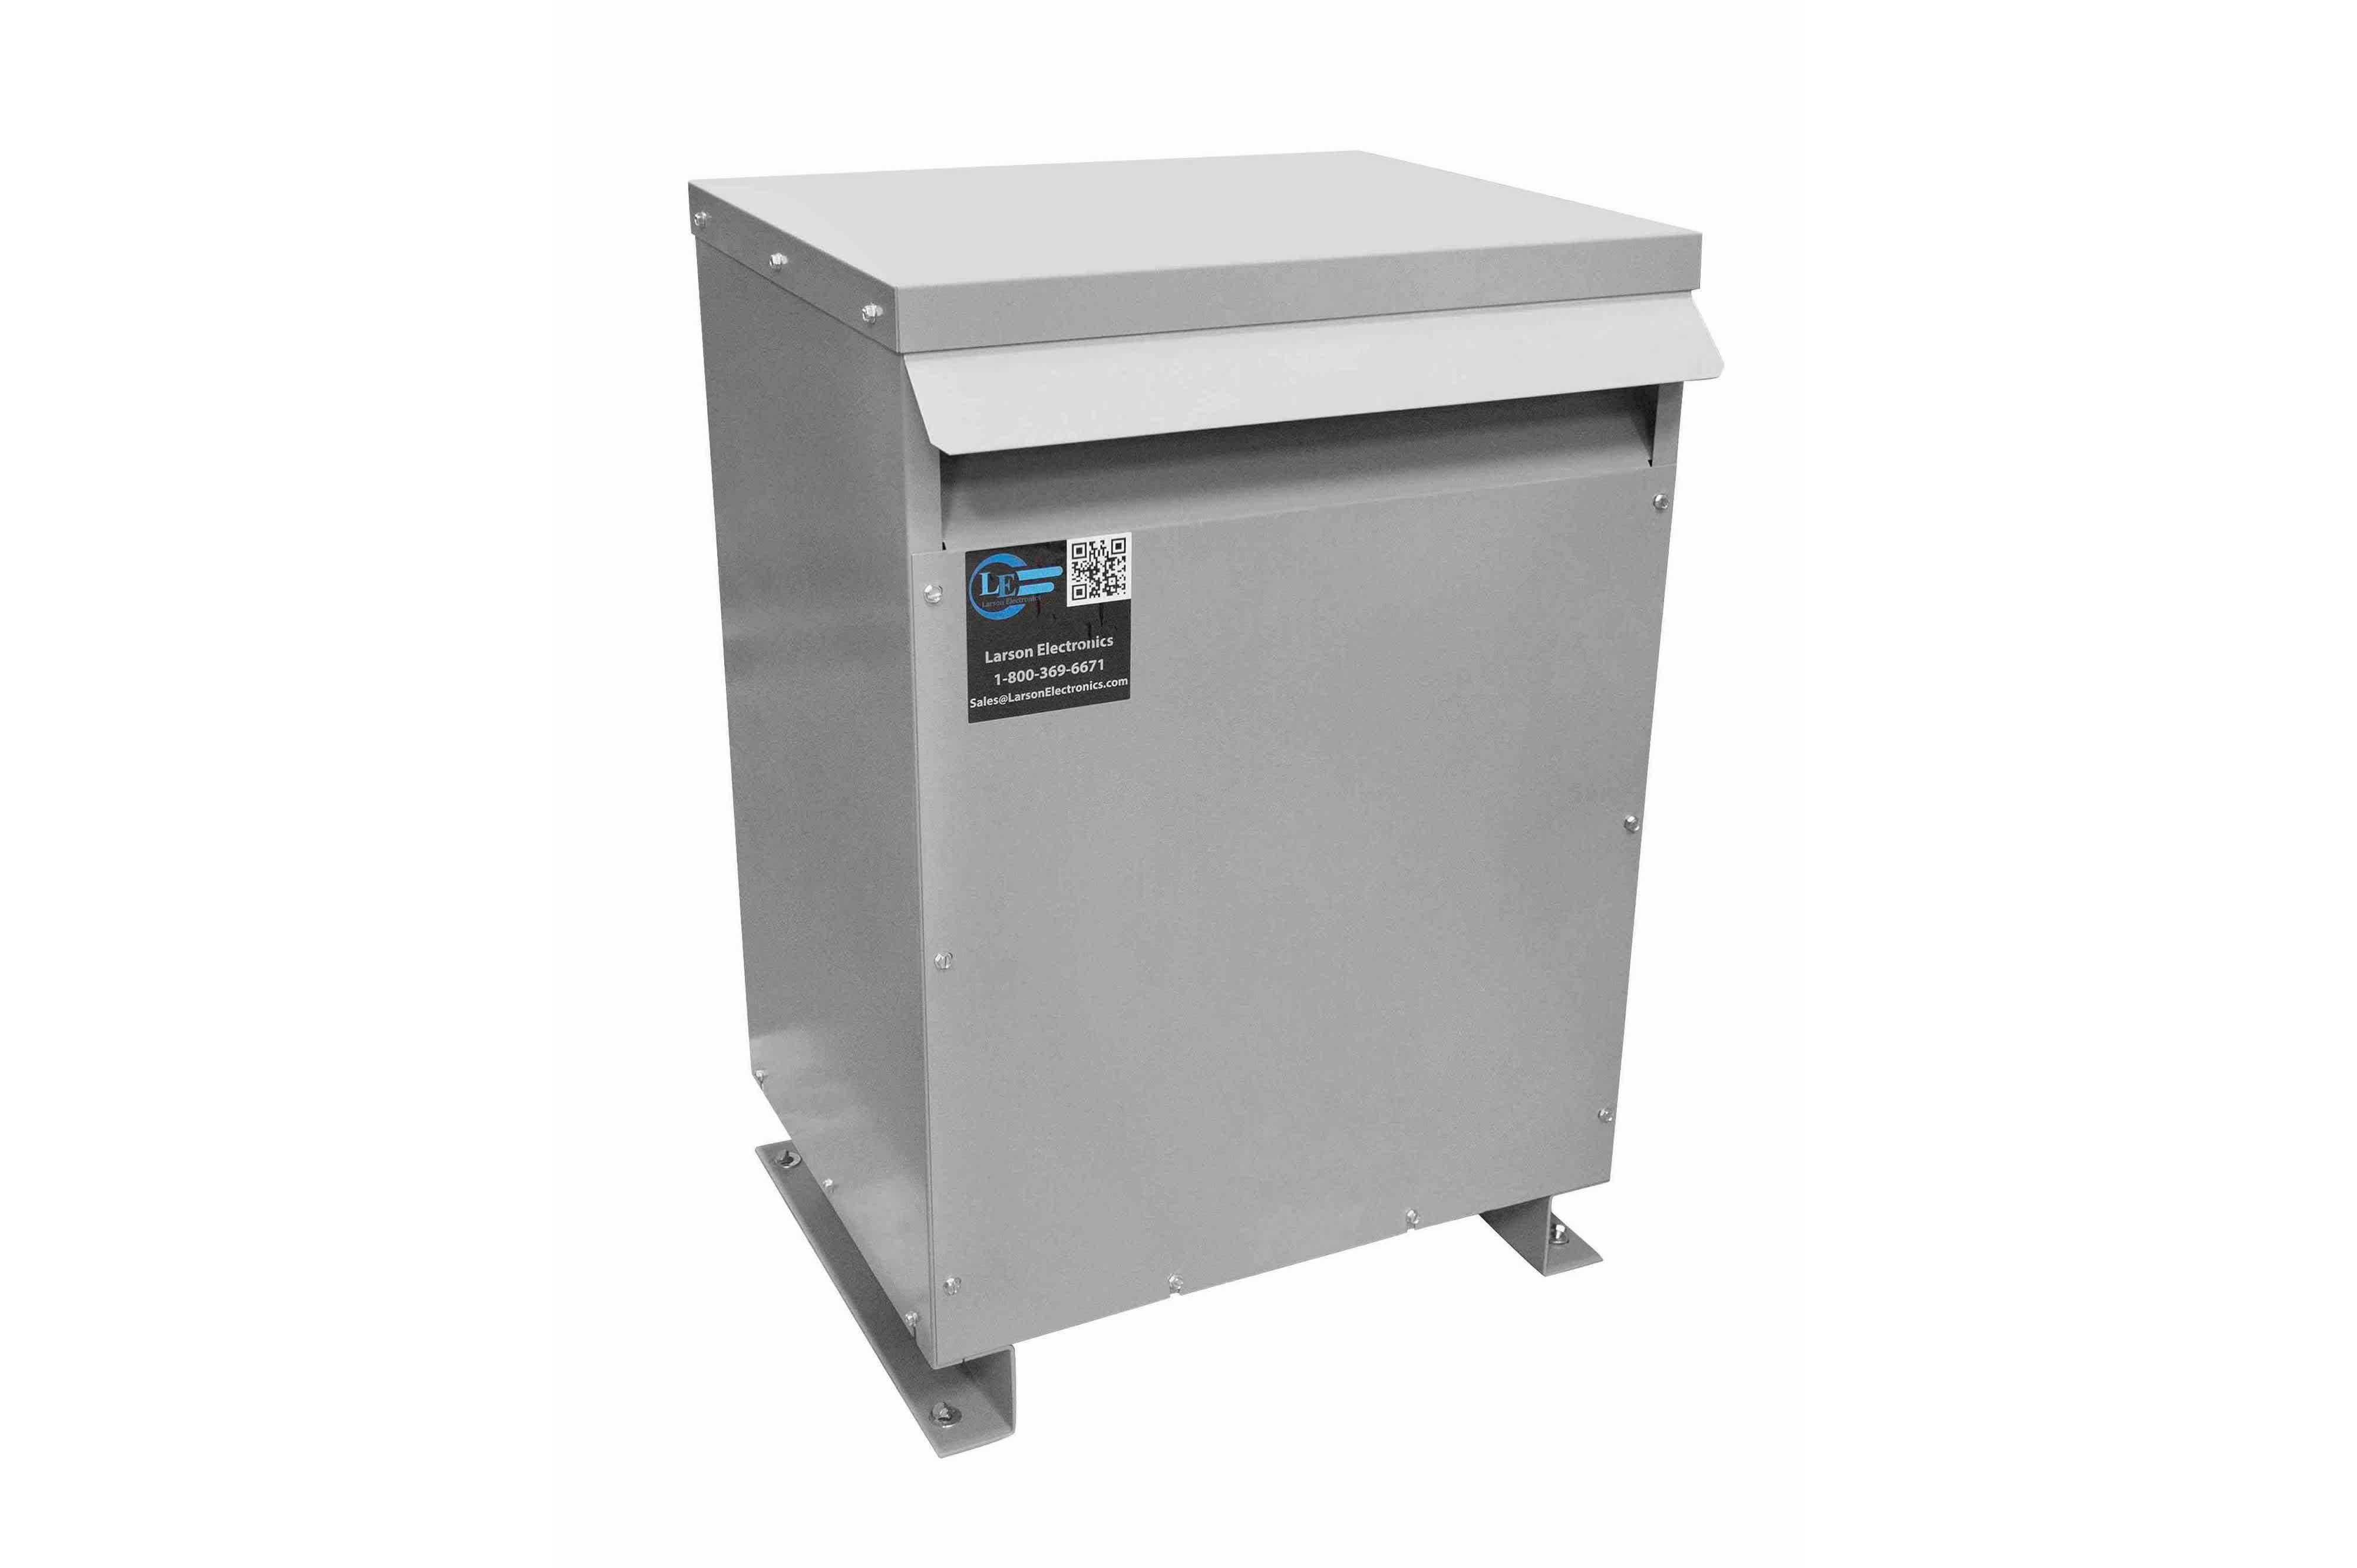 100 kVA 3PH Isolation Transformer, 600V Wye Primary, 208V Delta Secondary, N3R, Ventilated, 60 Hz